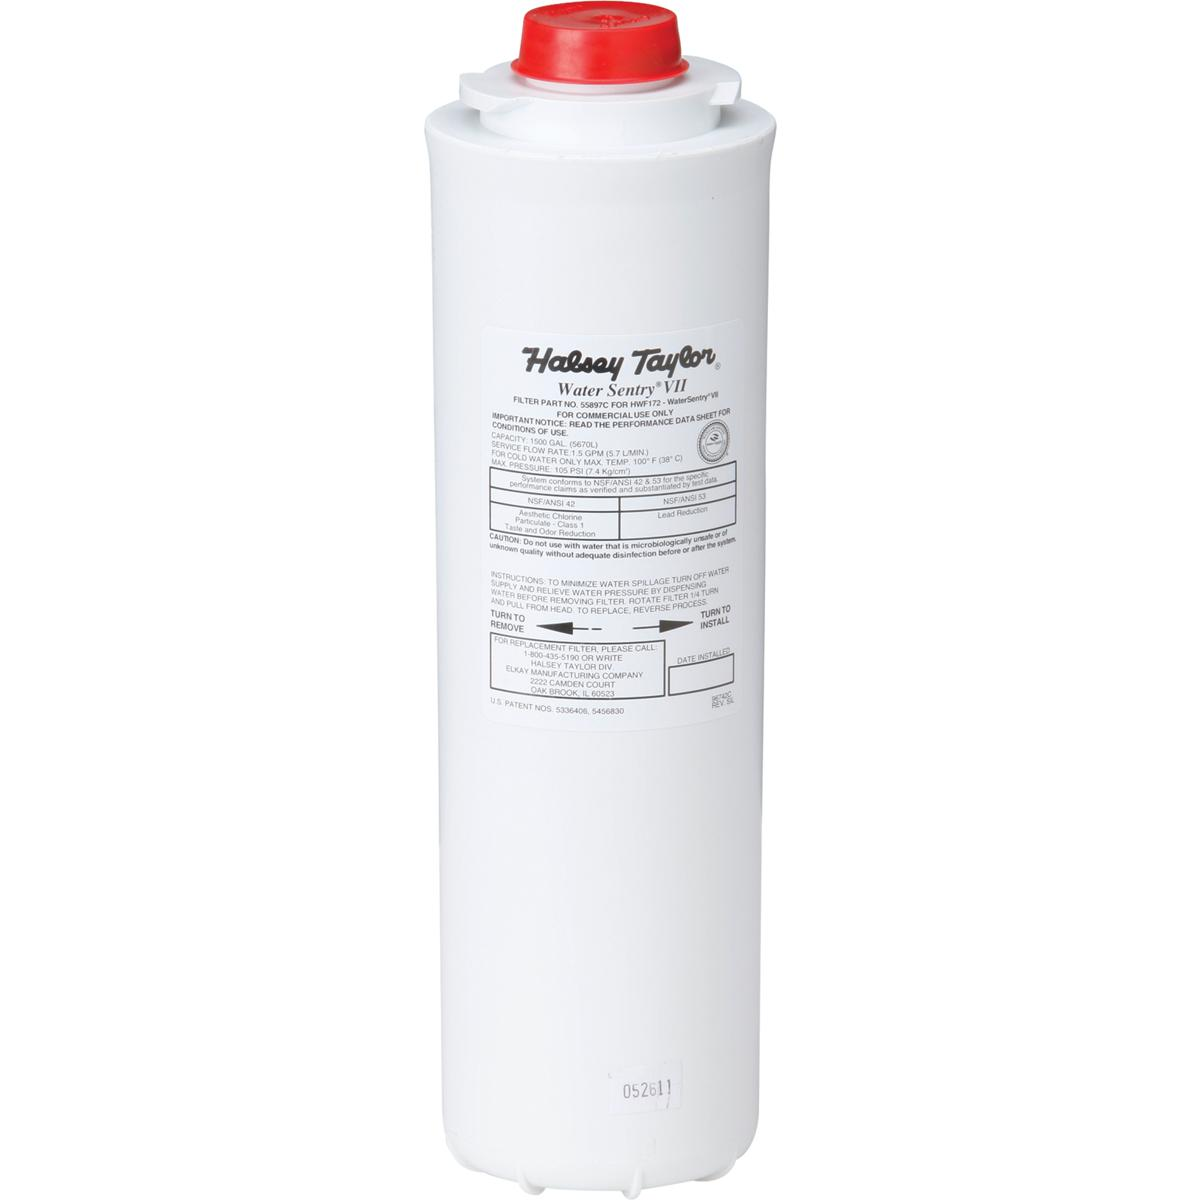 Elkay  Watersentry Plus Replacement Filters (12) (bottle Fillers) 1789105